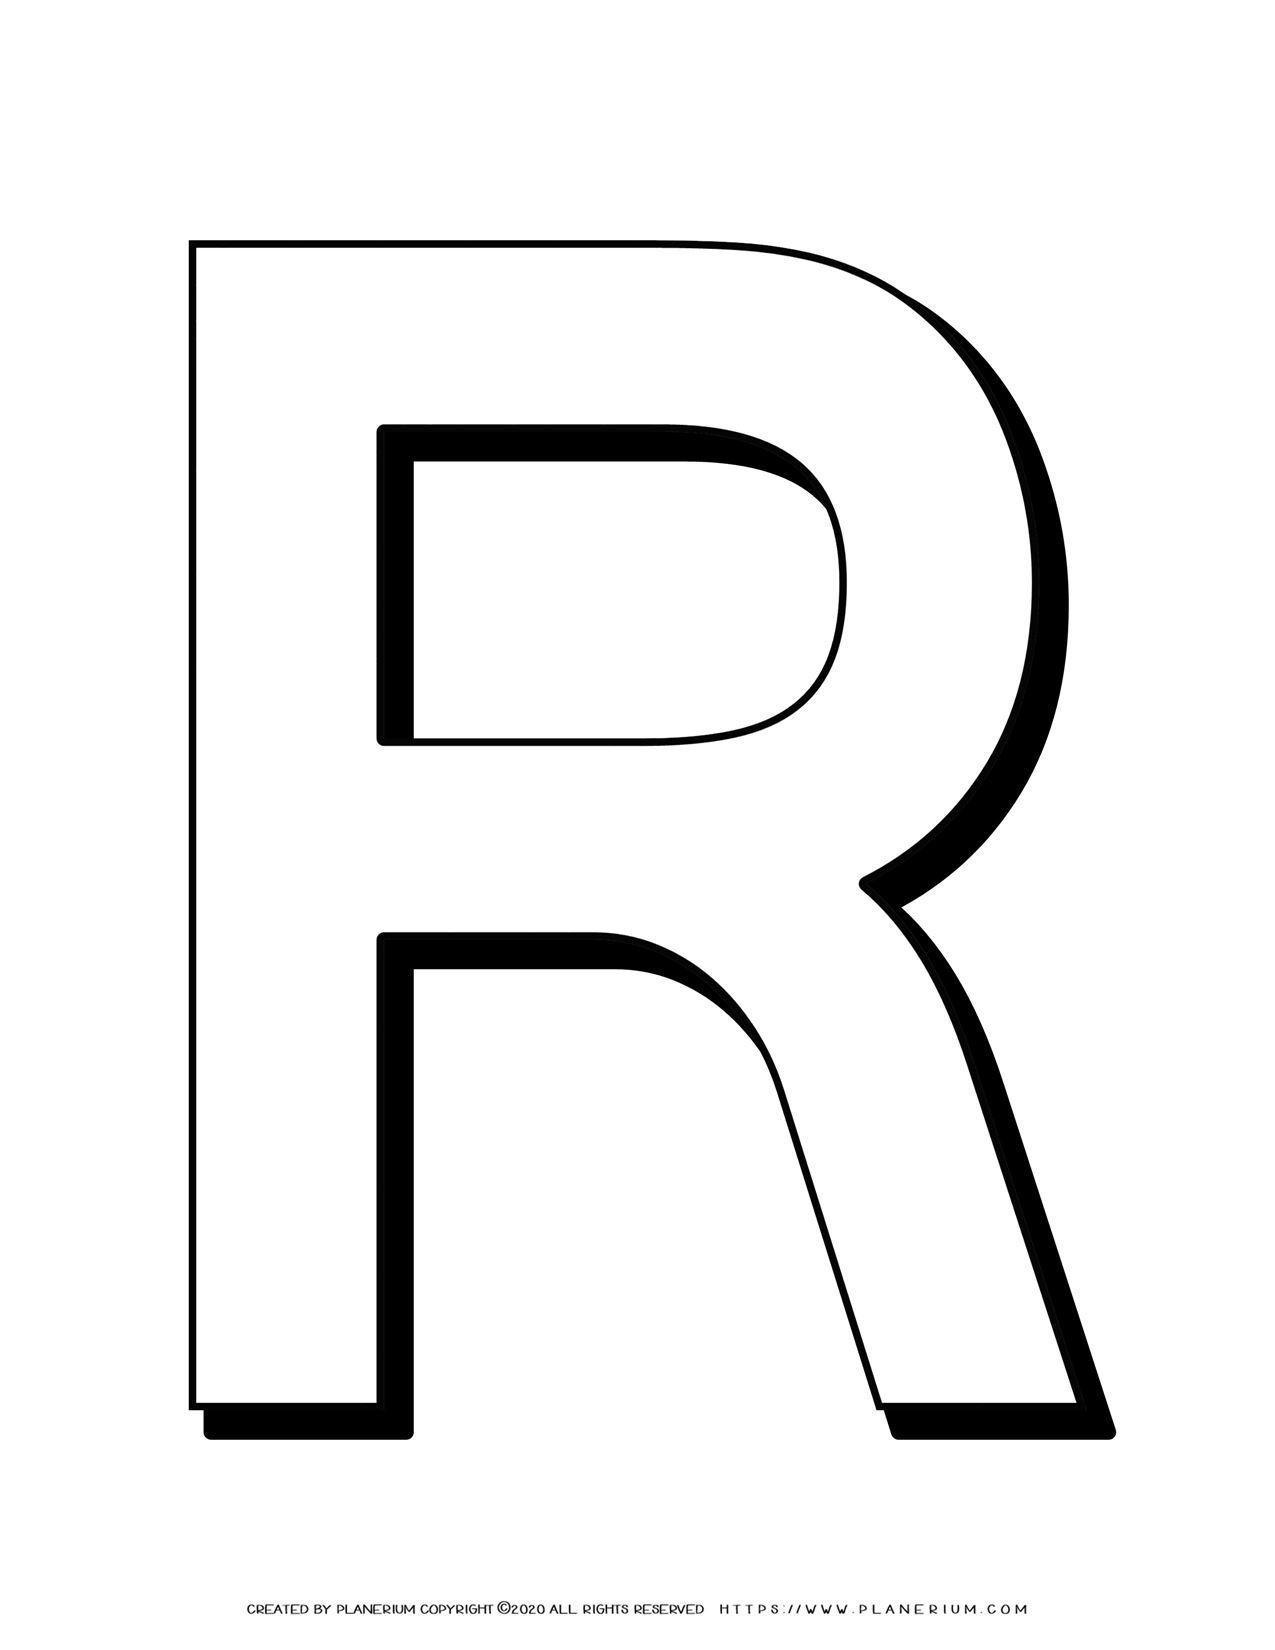 Alphabet Coloring Pages - English Letters - Capital R | Planerium